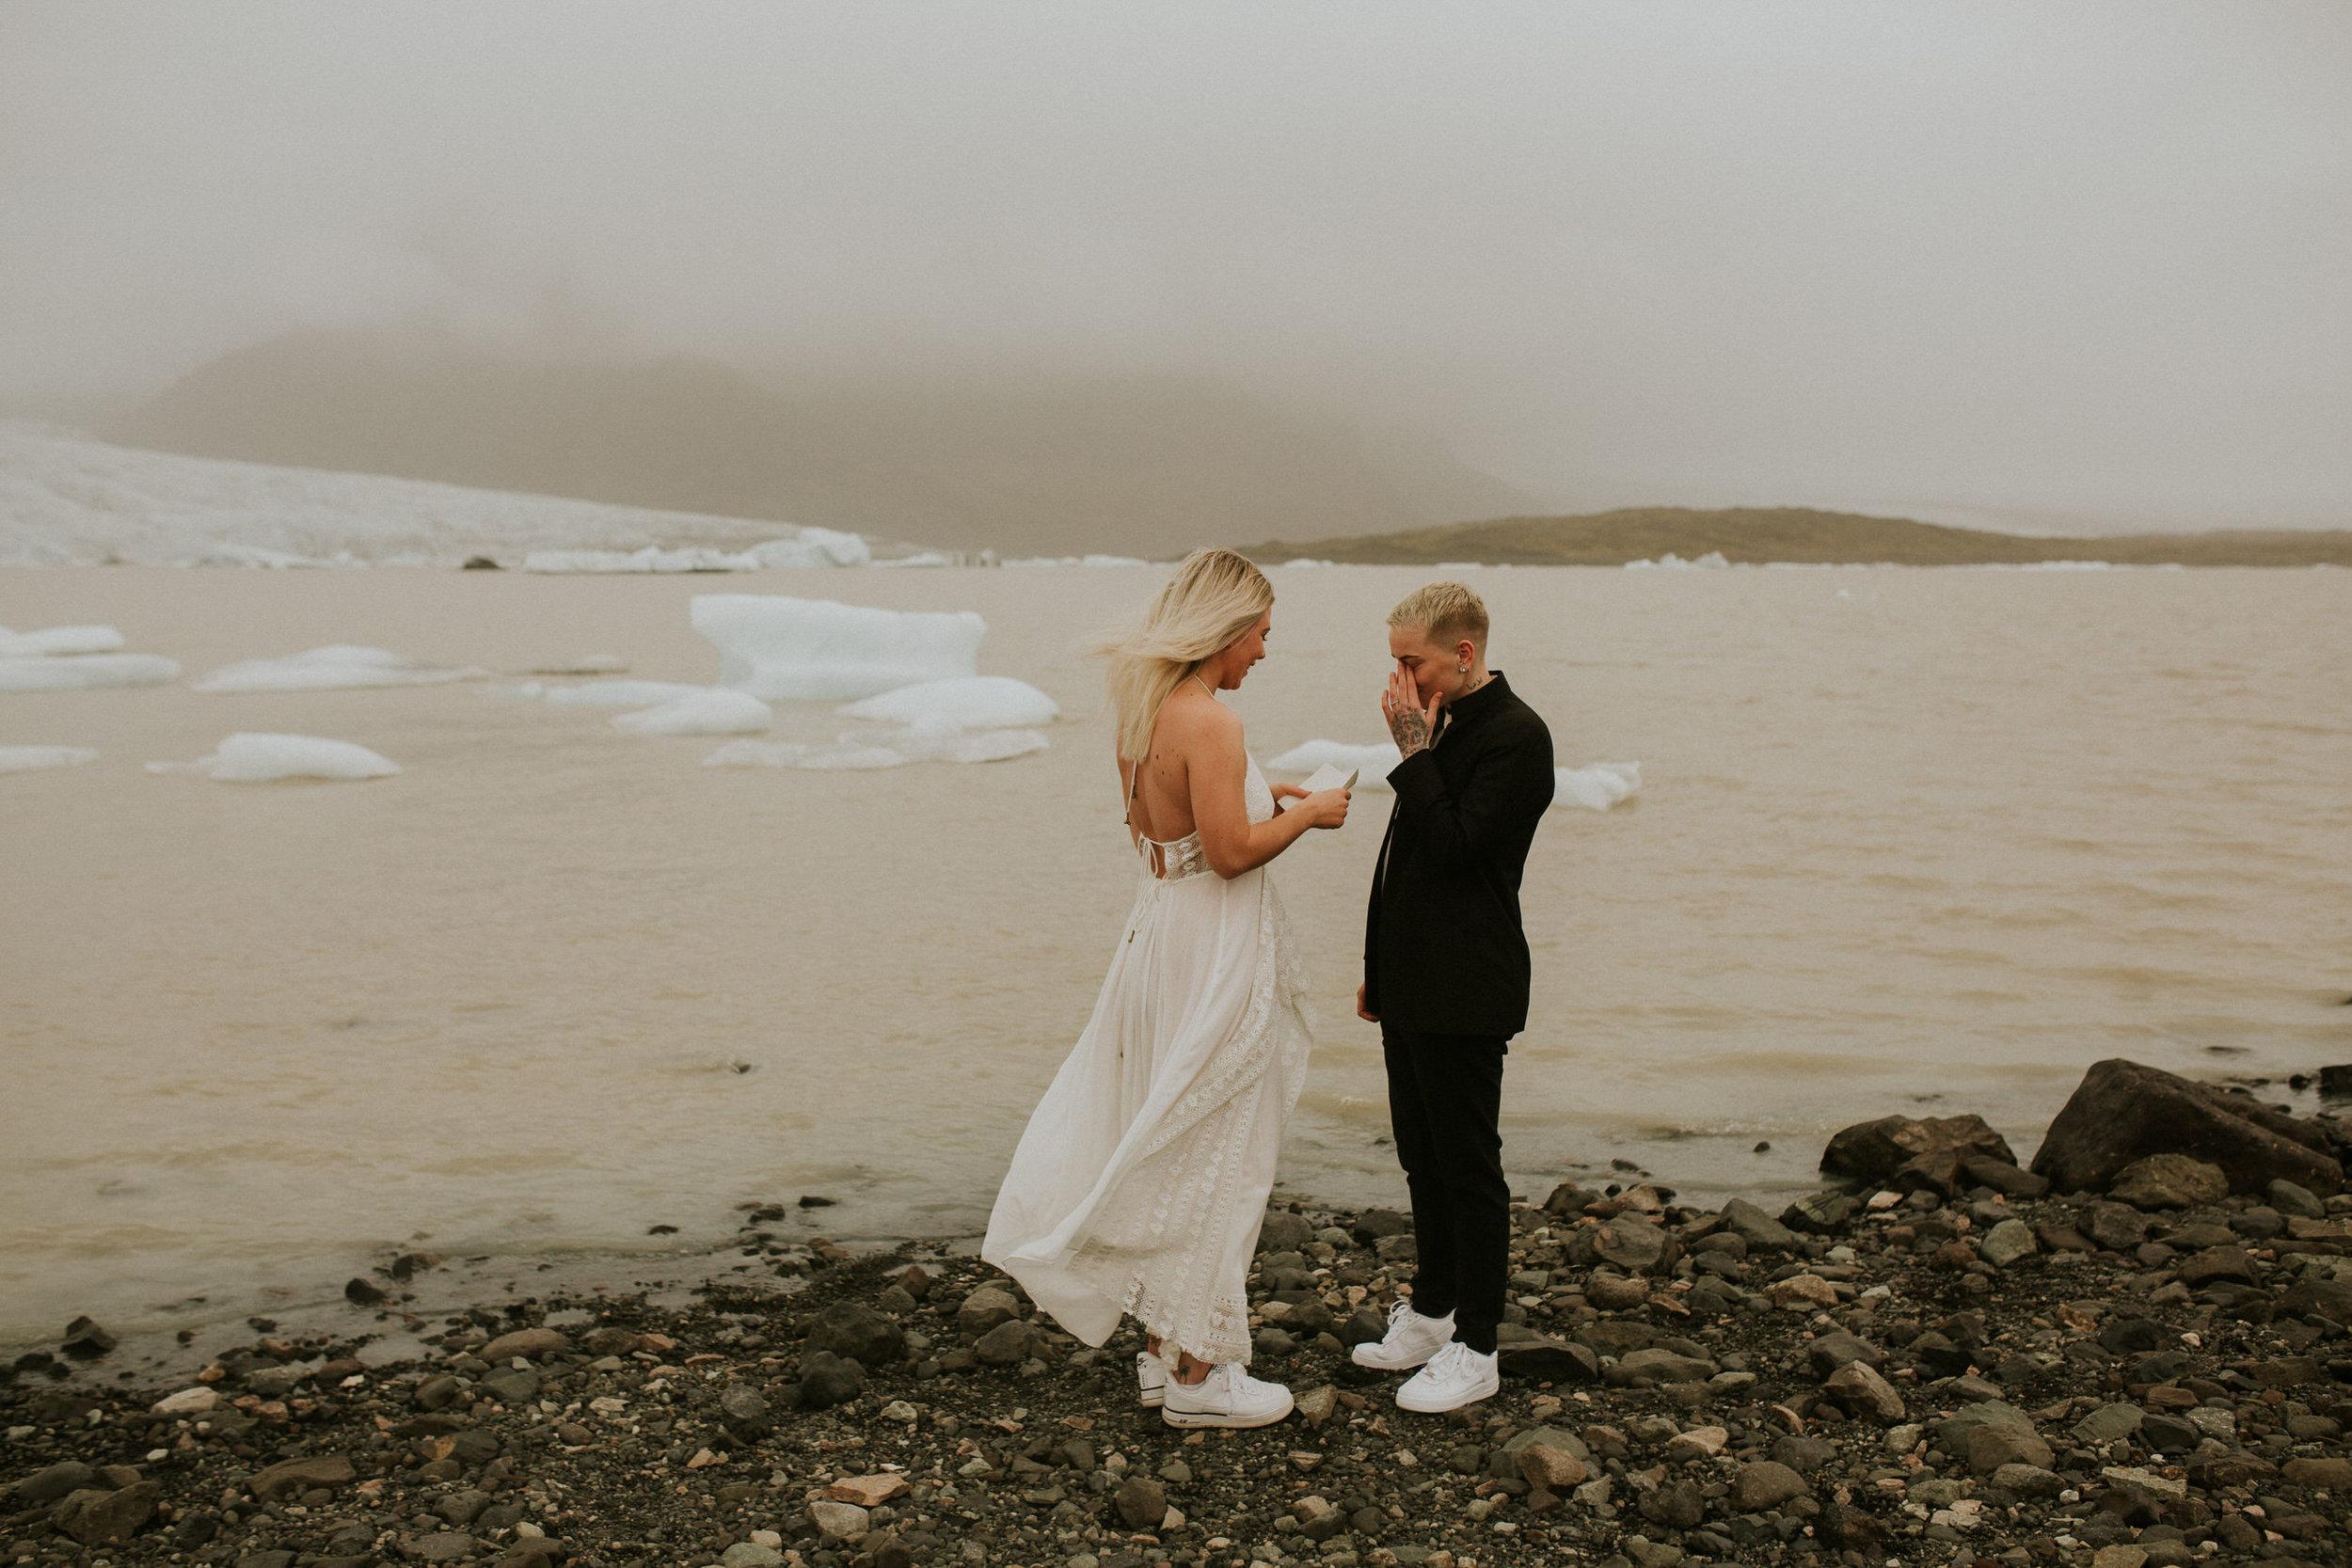 iceberg lagoon same sex elopement iceland first look photographer breeanna lasher lgbt wedding